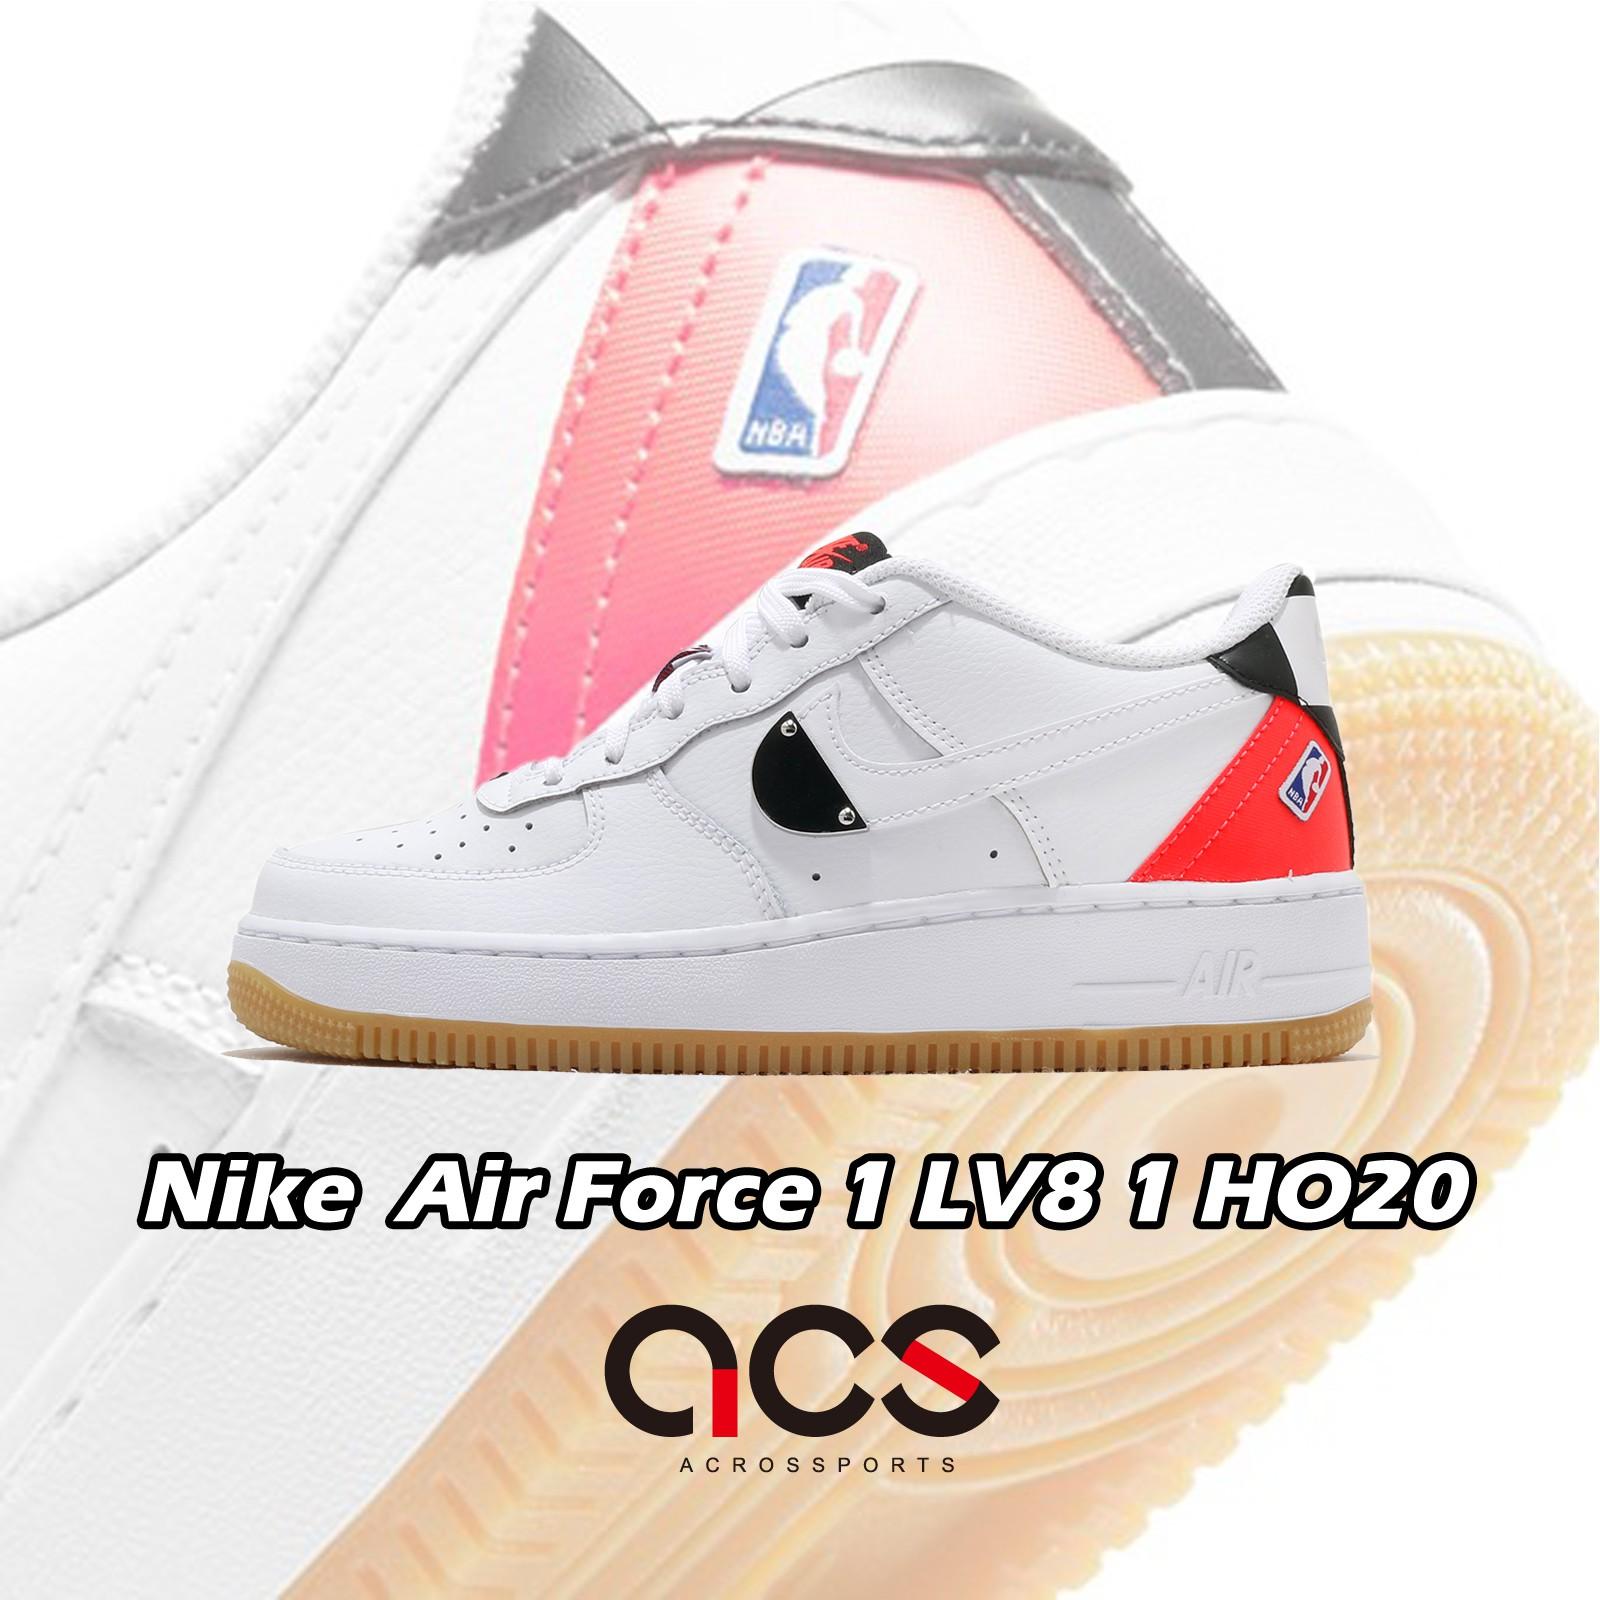 Nike Air Force 1 LV8 GS 白 銀 粉紅 金屬 小白鞋 女鞋 NBA【ACS】 CT3842-101